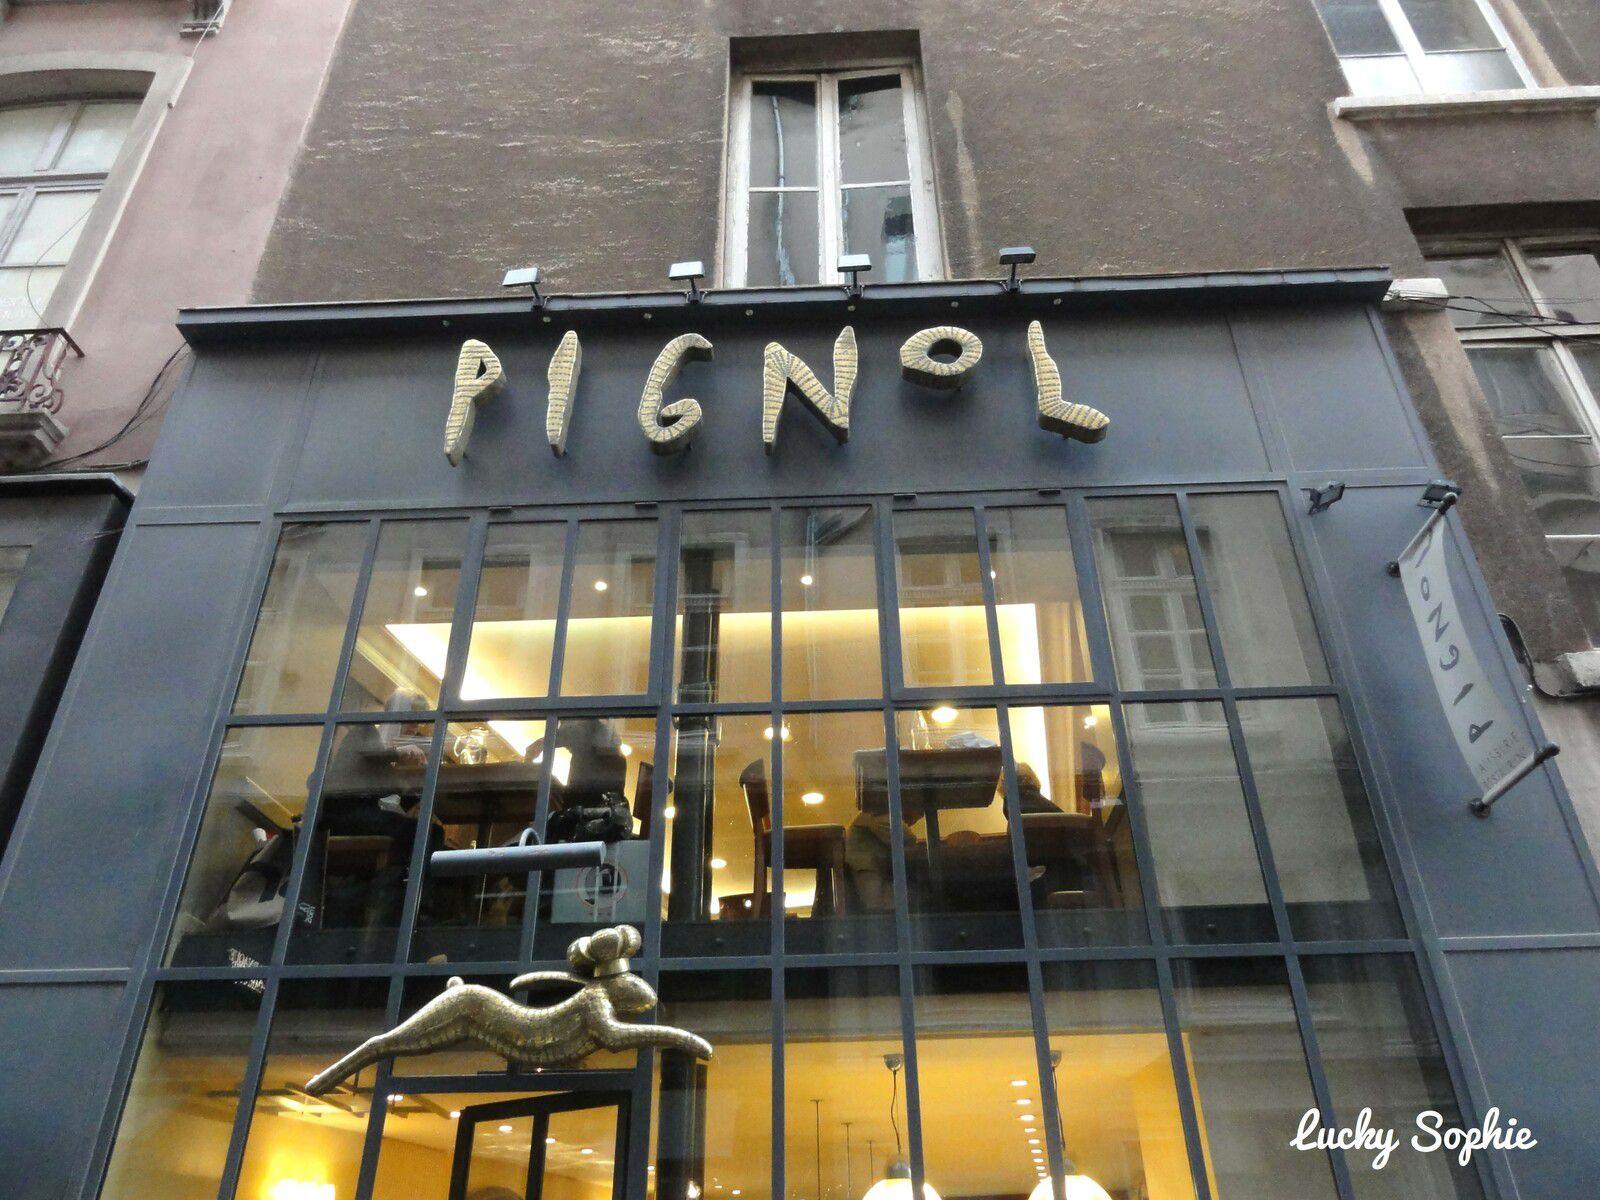 Pâtisserie Pignol 17 rue Emile Zola Lyon 2e